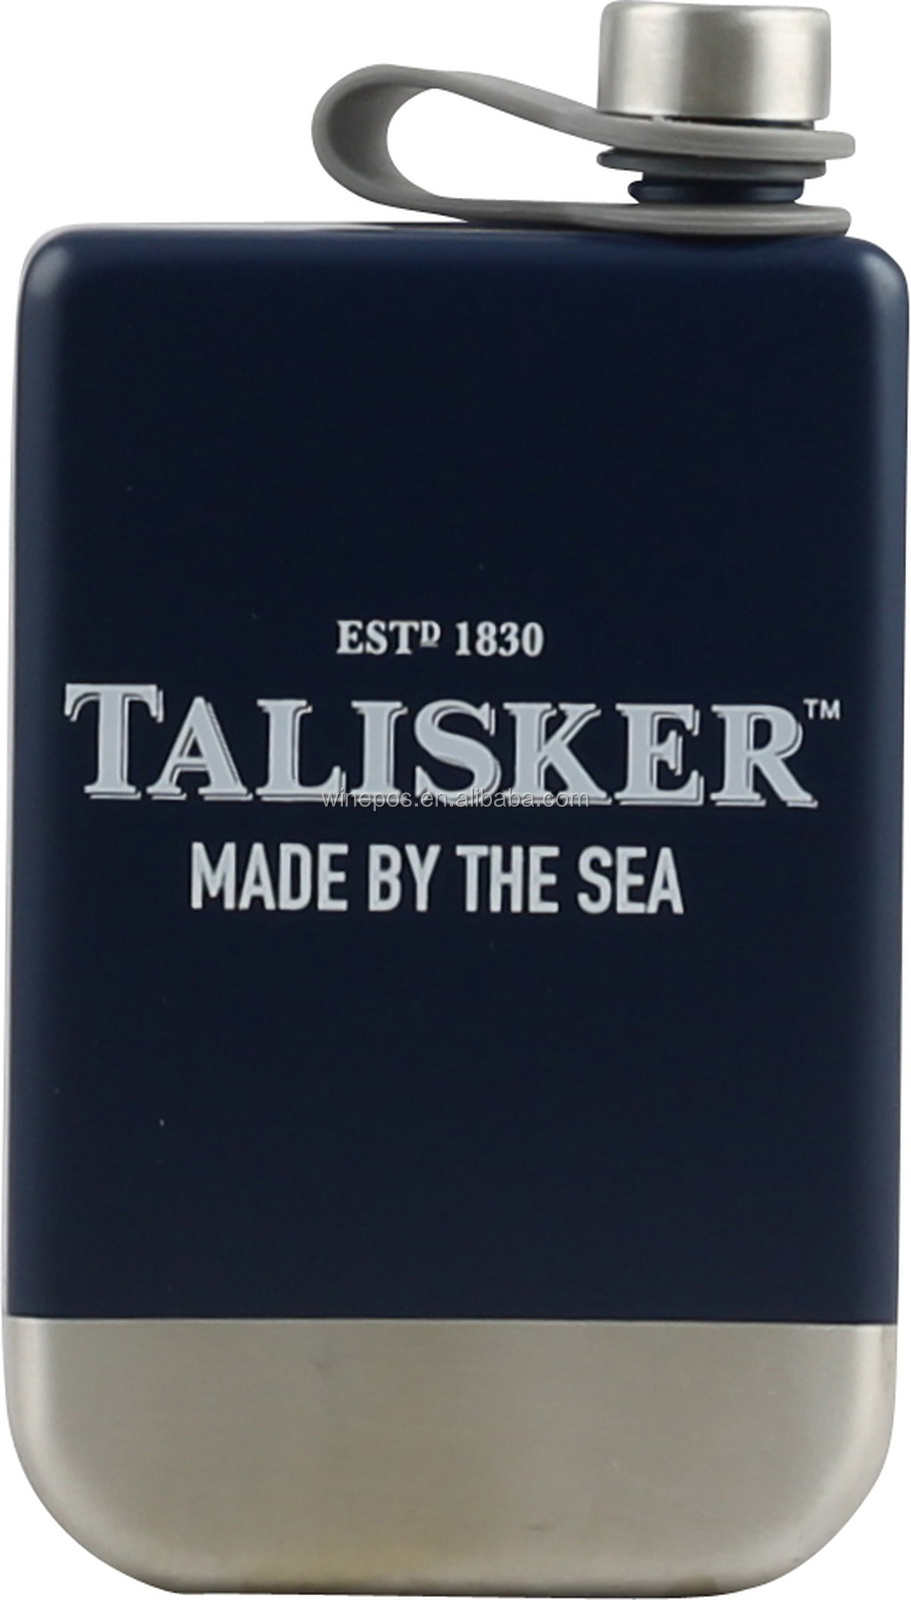 Stainless steel flask, flask, HIP flask, wine flask, Talisker hip flask